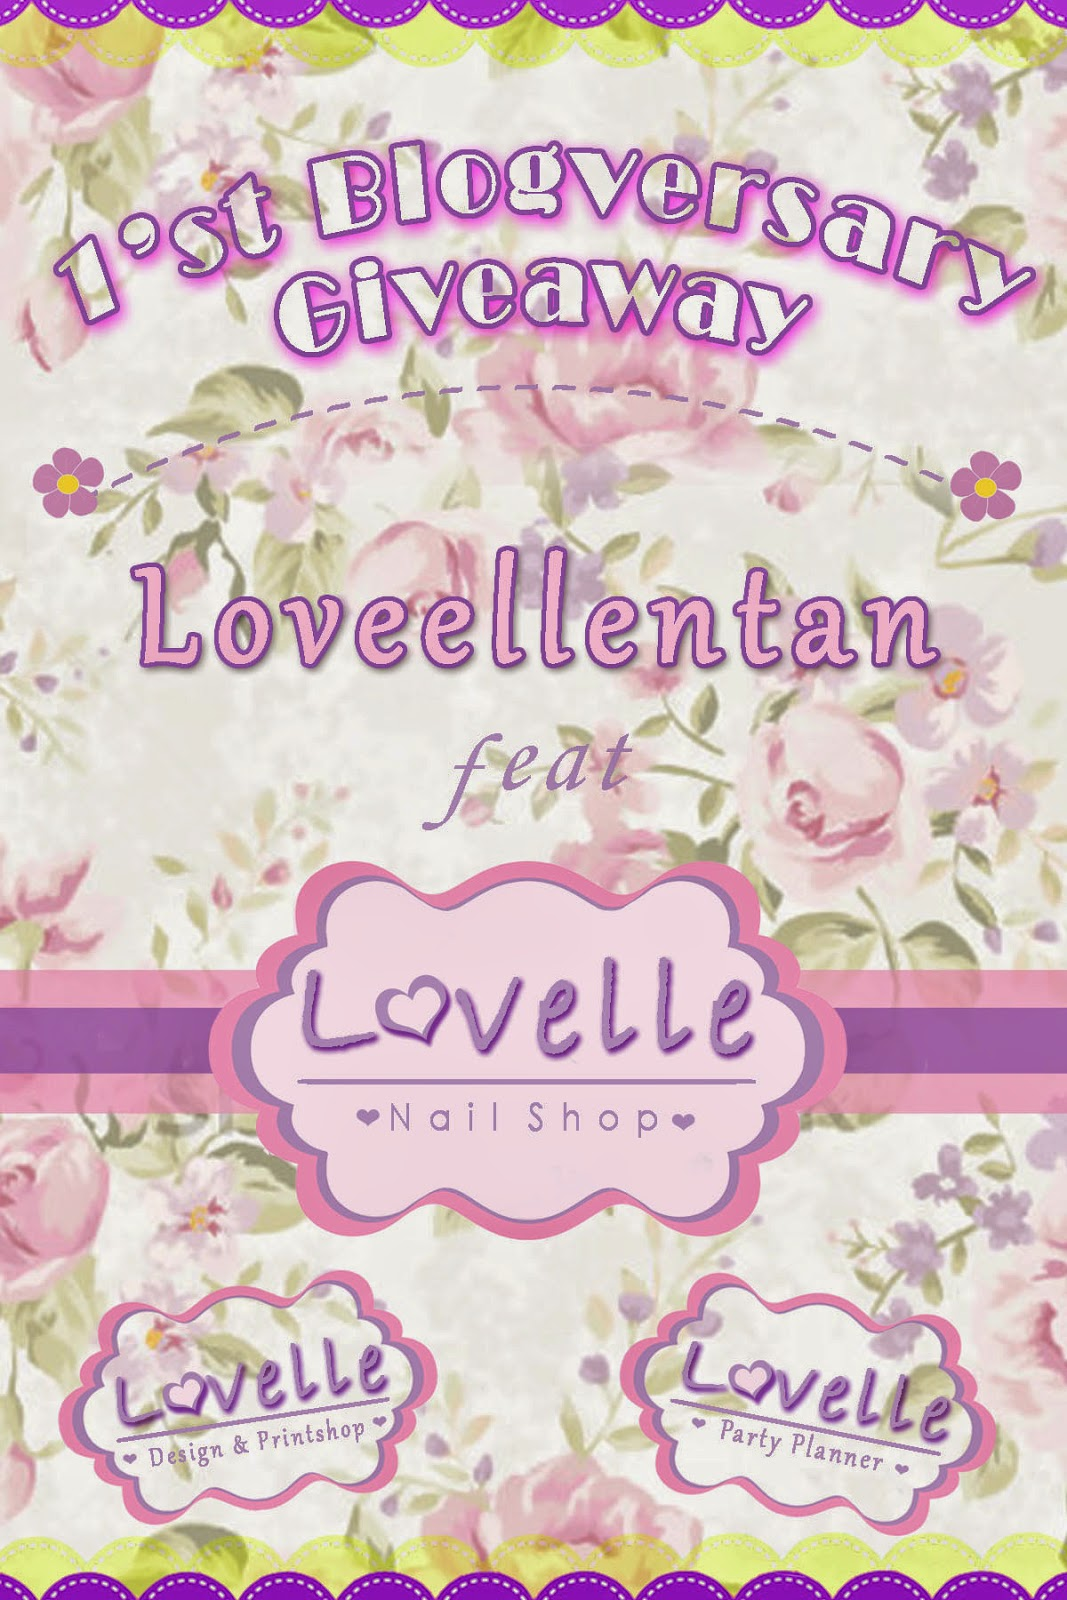 http://loveellentan.blogspot.com/2014/09/1st-blogversary-giveaway-loveellentan.html